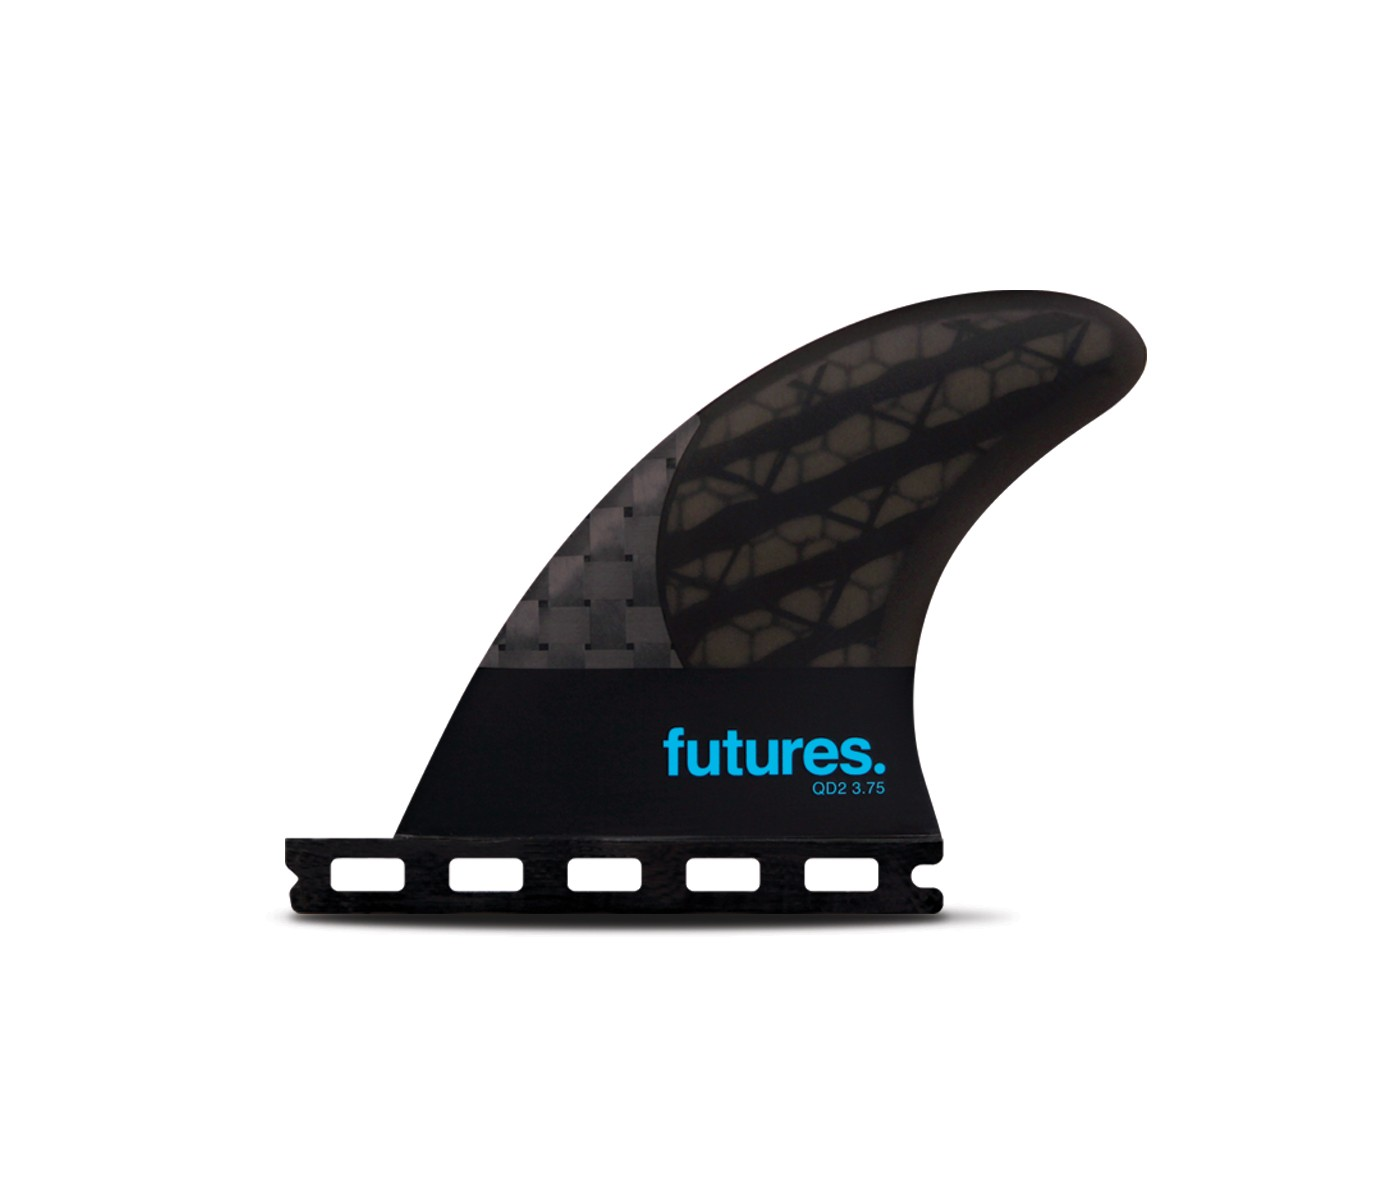 FUTURE(フューチャー)サーフボード用フィン・QUAD REAR QD2-3.75 BLACK STIX3.0